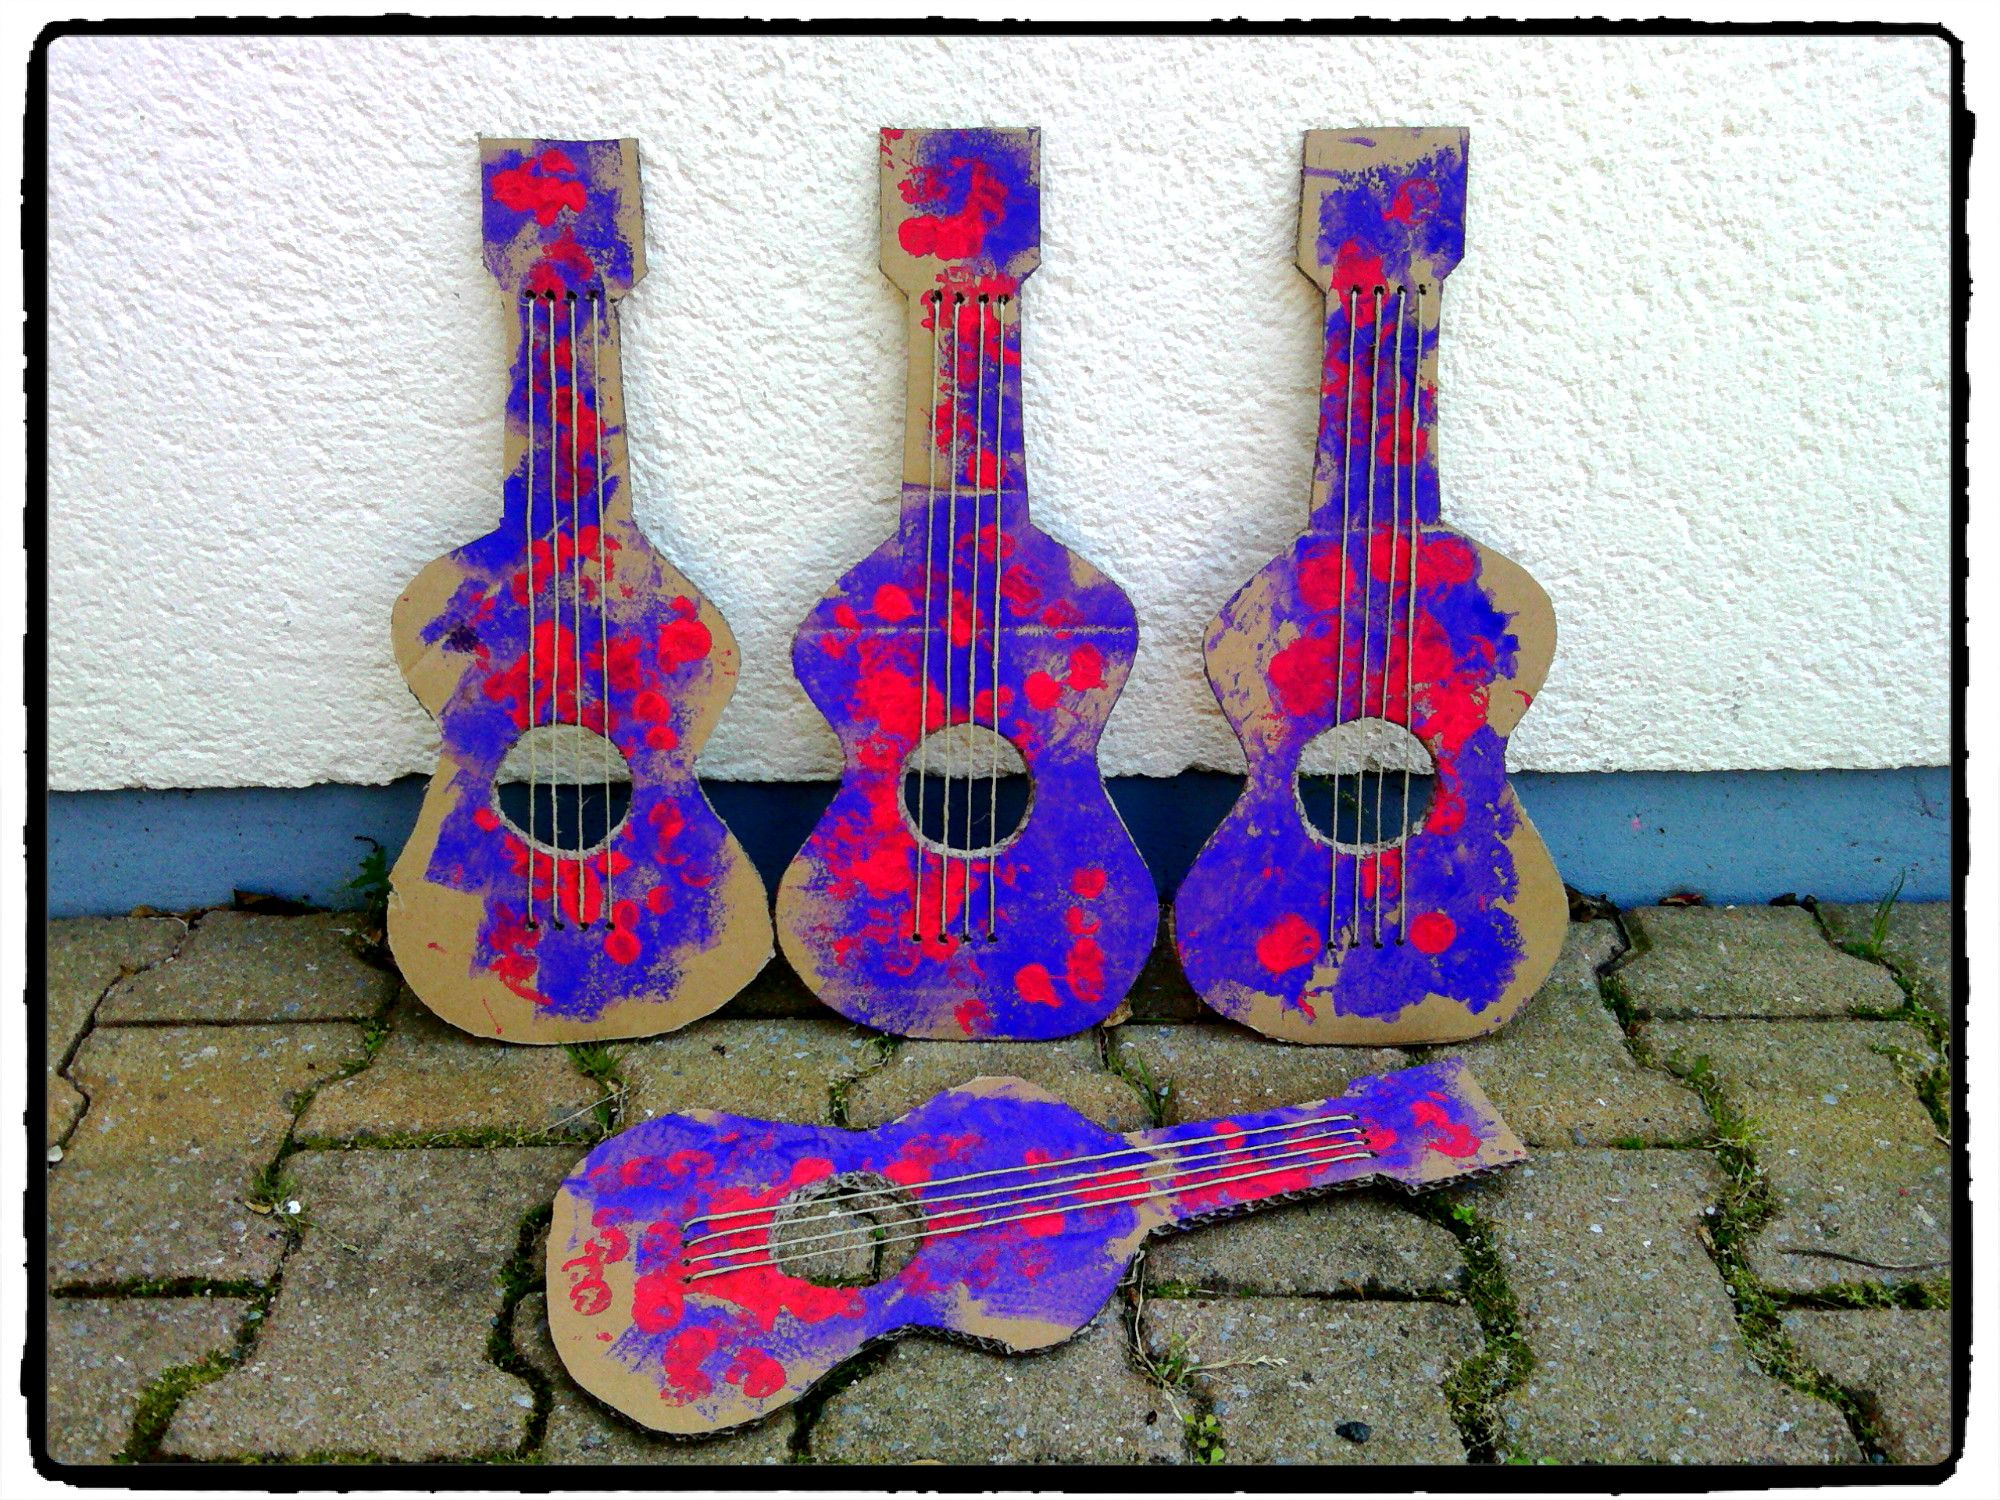 fabriquer sa guitare en carton instrument de musique. Black Bedroom Furniture Sets. Home Design Ideas